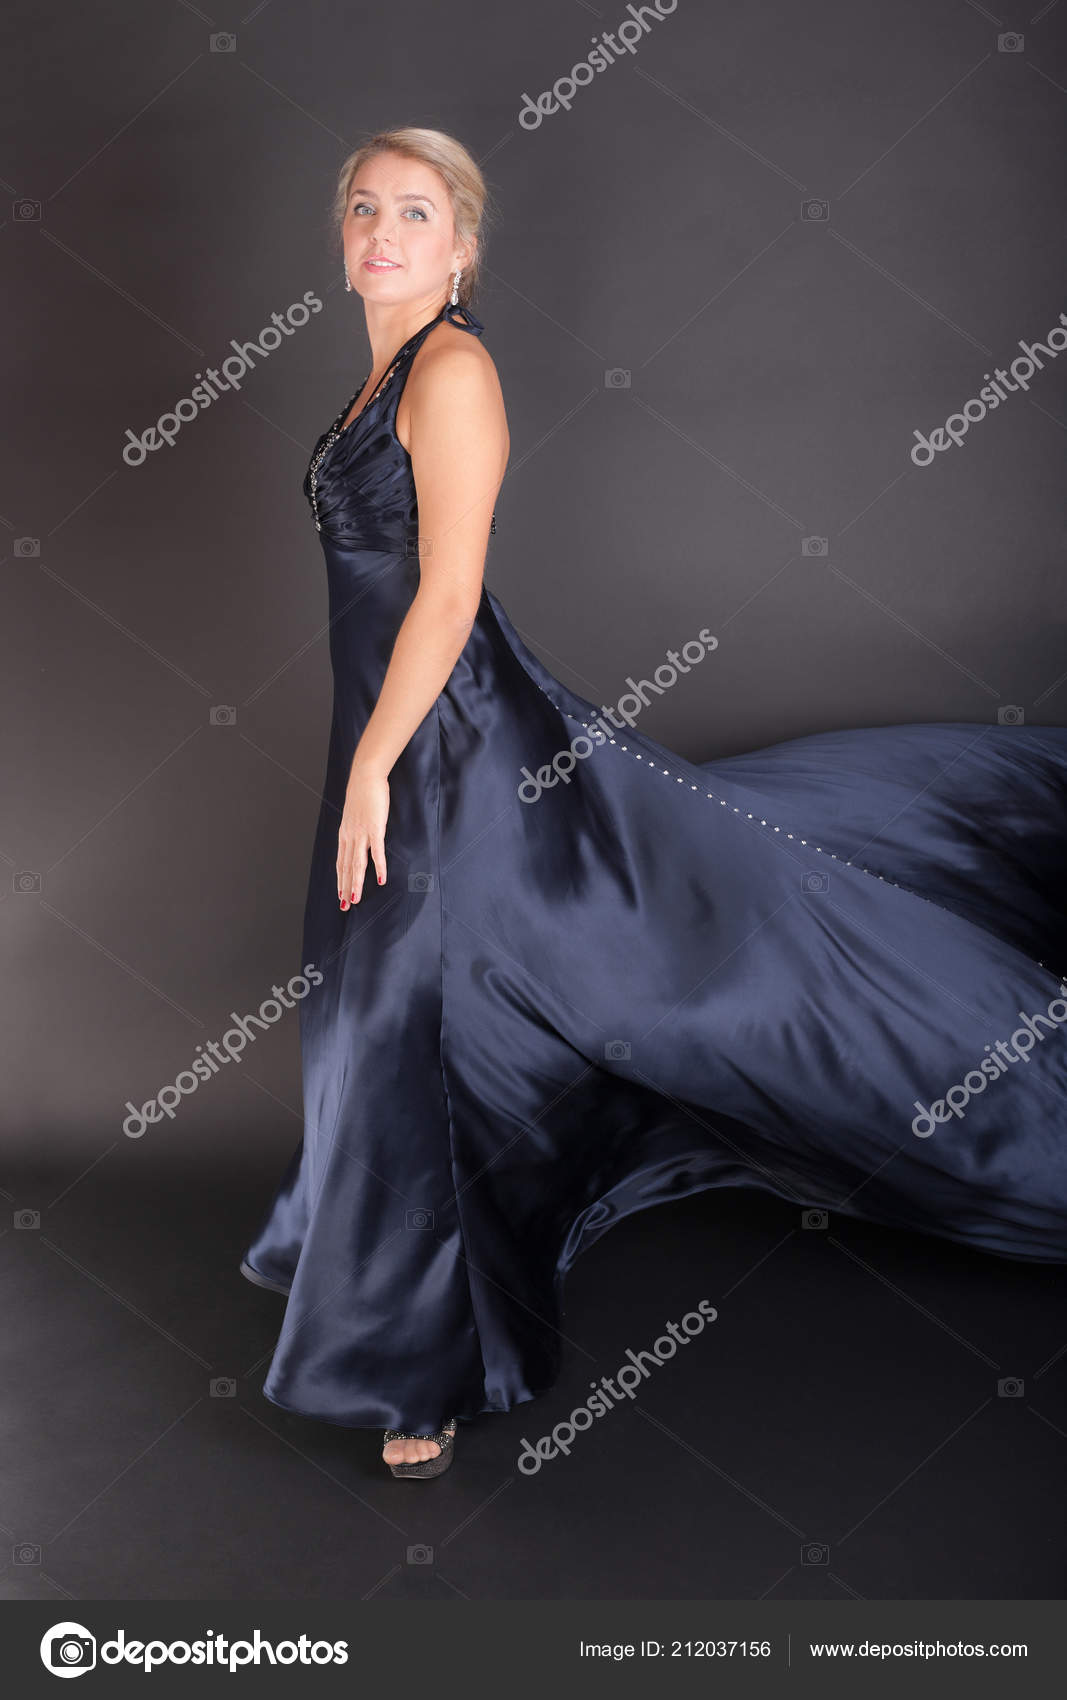 Chica Vestido Noche Azul Oscuro Sobre Fondo Negro Foto De